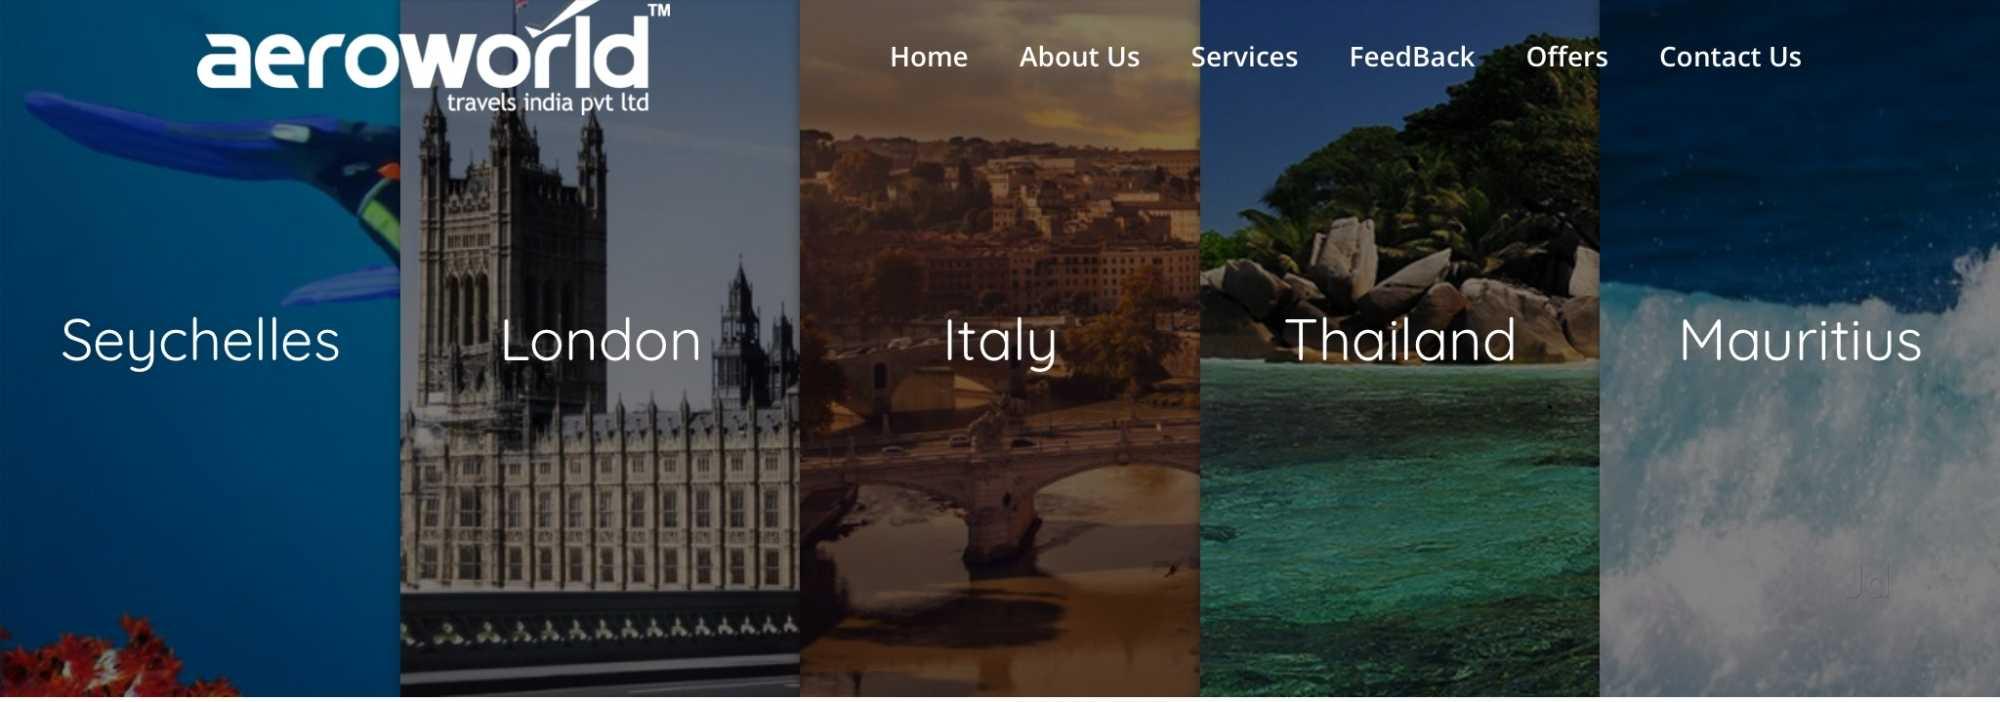 Top 50 Visa Assistance For Turkey in Chennai - Best Visa